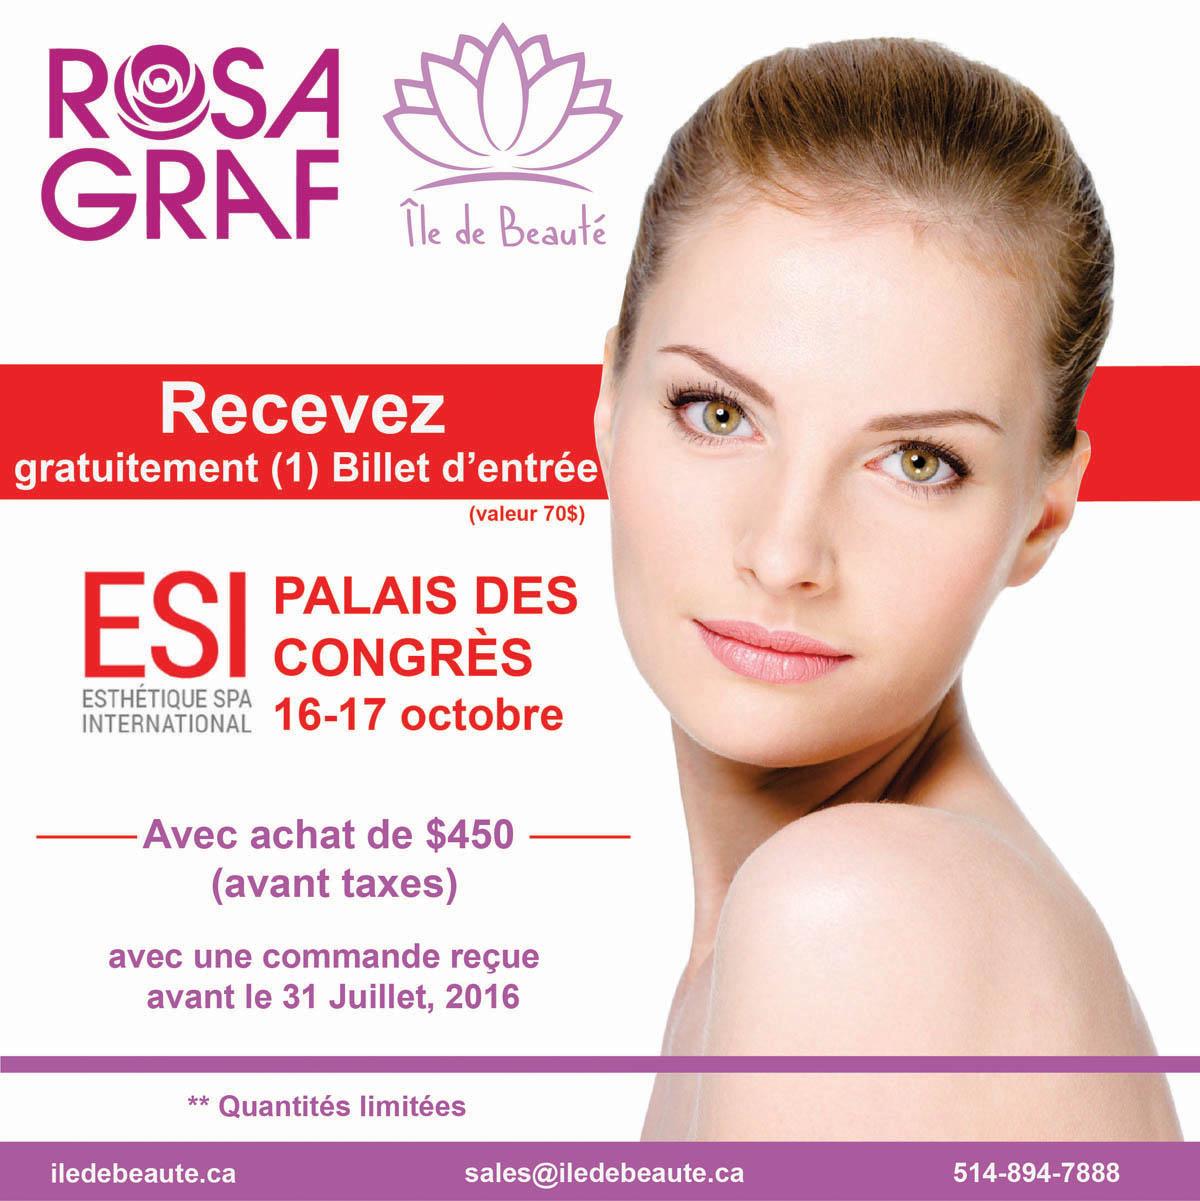 Rosa Graf Ile de Beaute show ESI Montreal